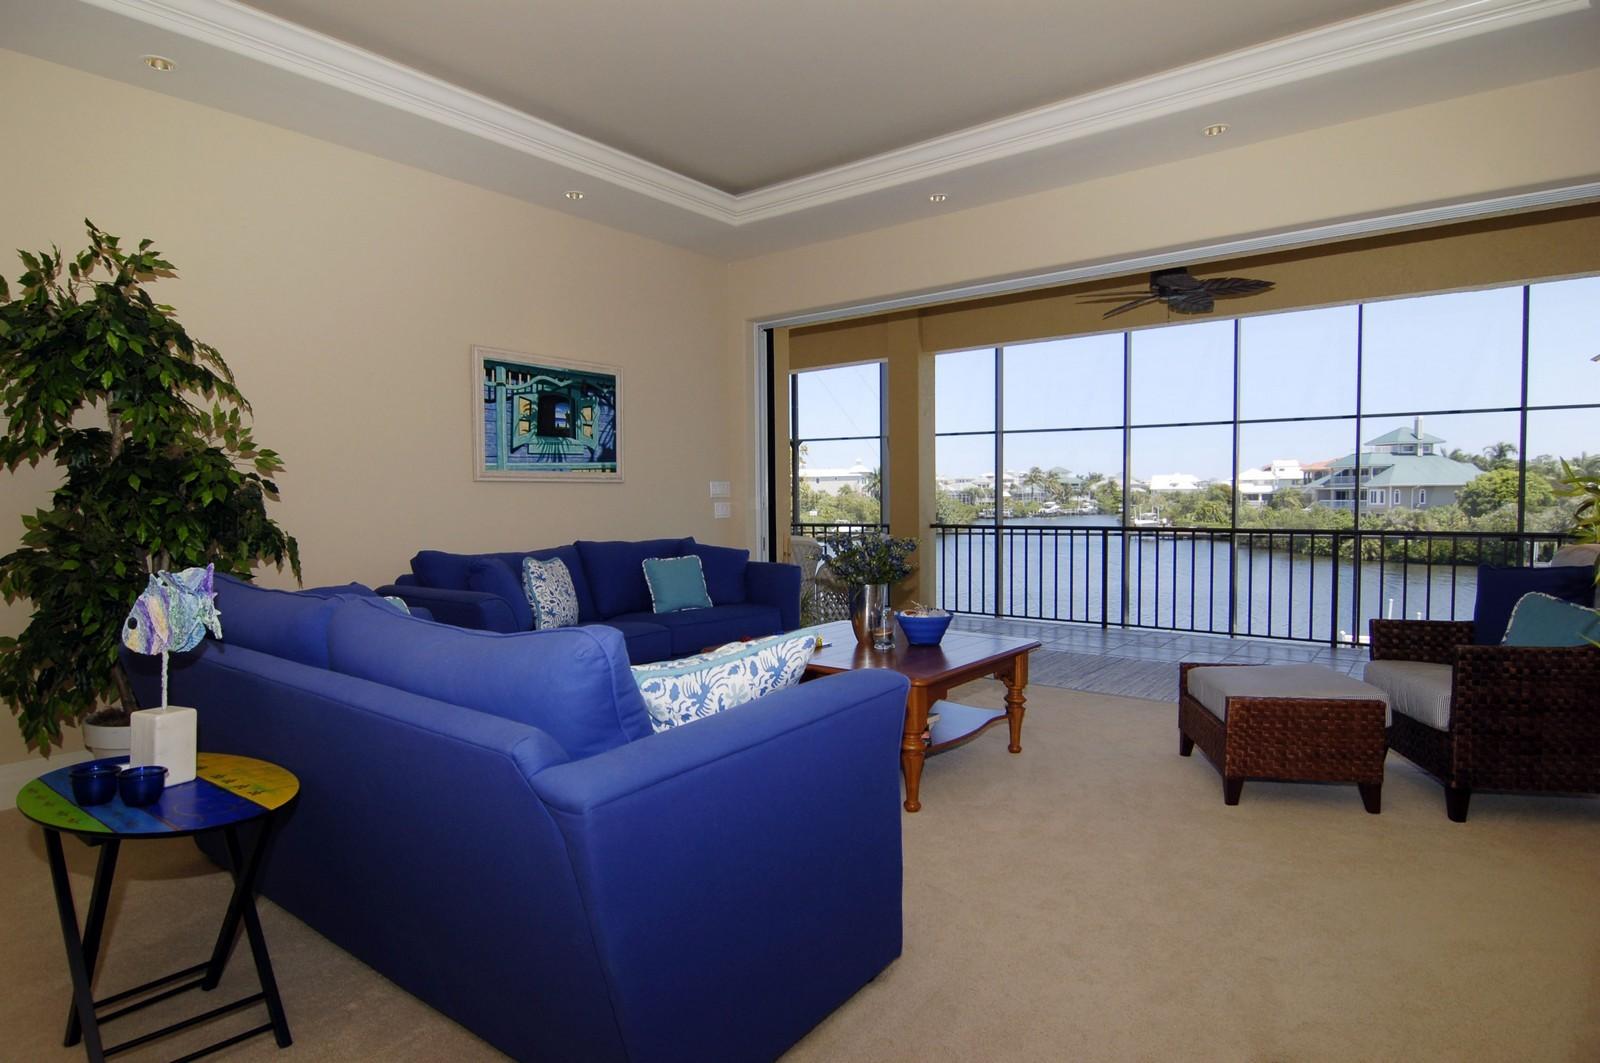 Real Estate Photography - 222 Barefoot Beach Blvd, Bonita Springs, FL, 34134 - Location 1